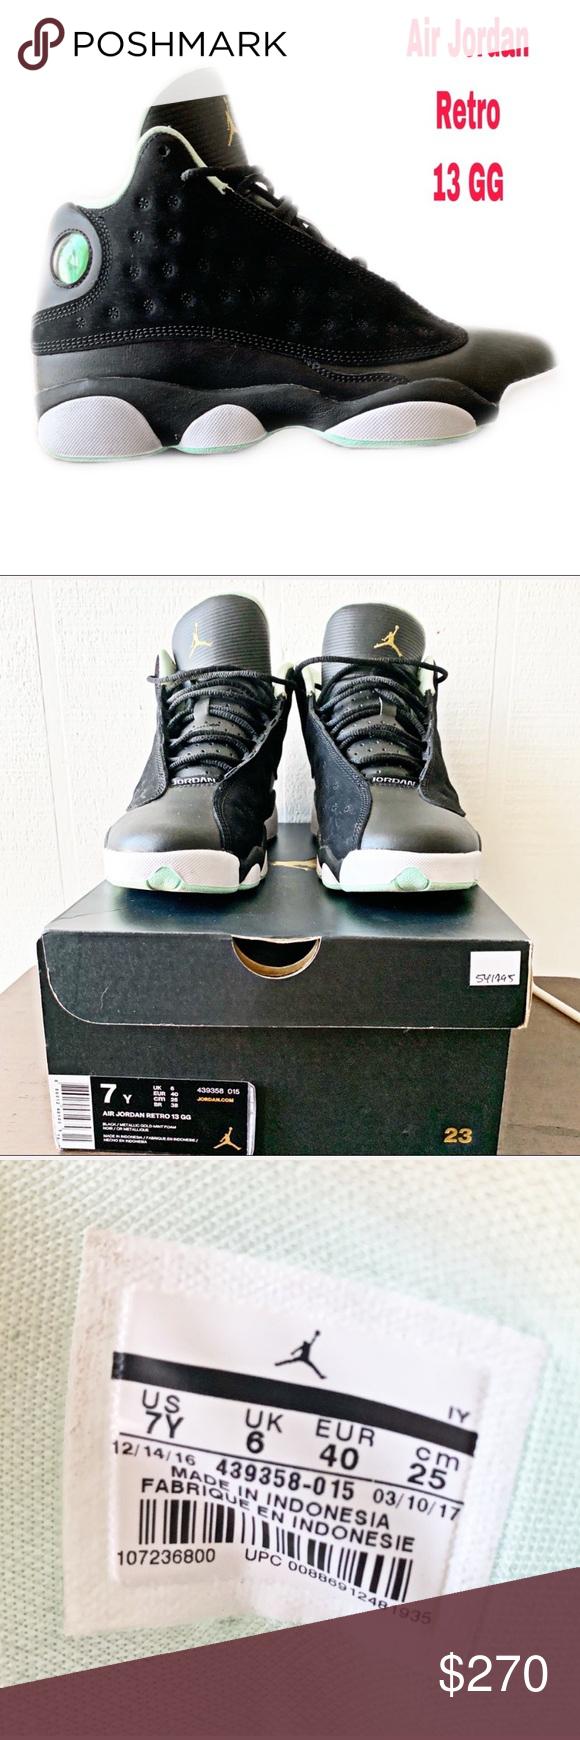 Photo of 🏀 Air Jordan Black Retro 13 GG Size 7 Authentic Air Jordan Black Retro 13 GG …